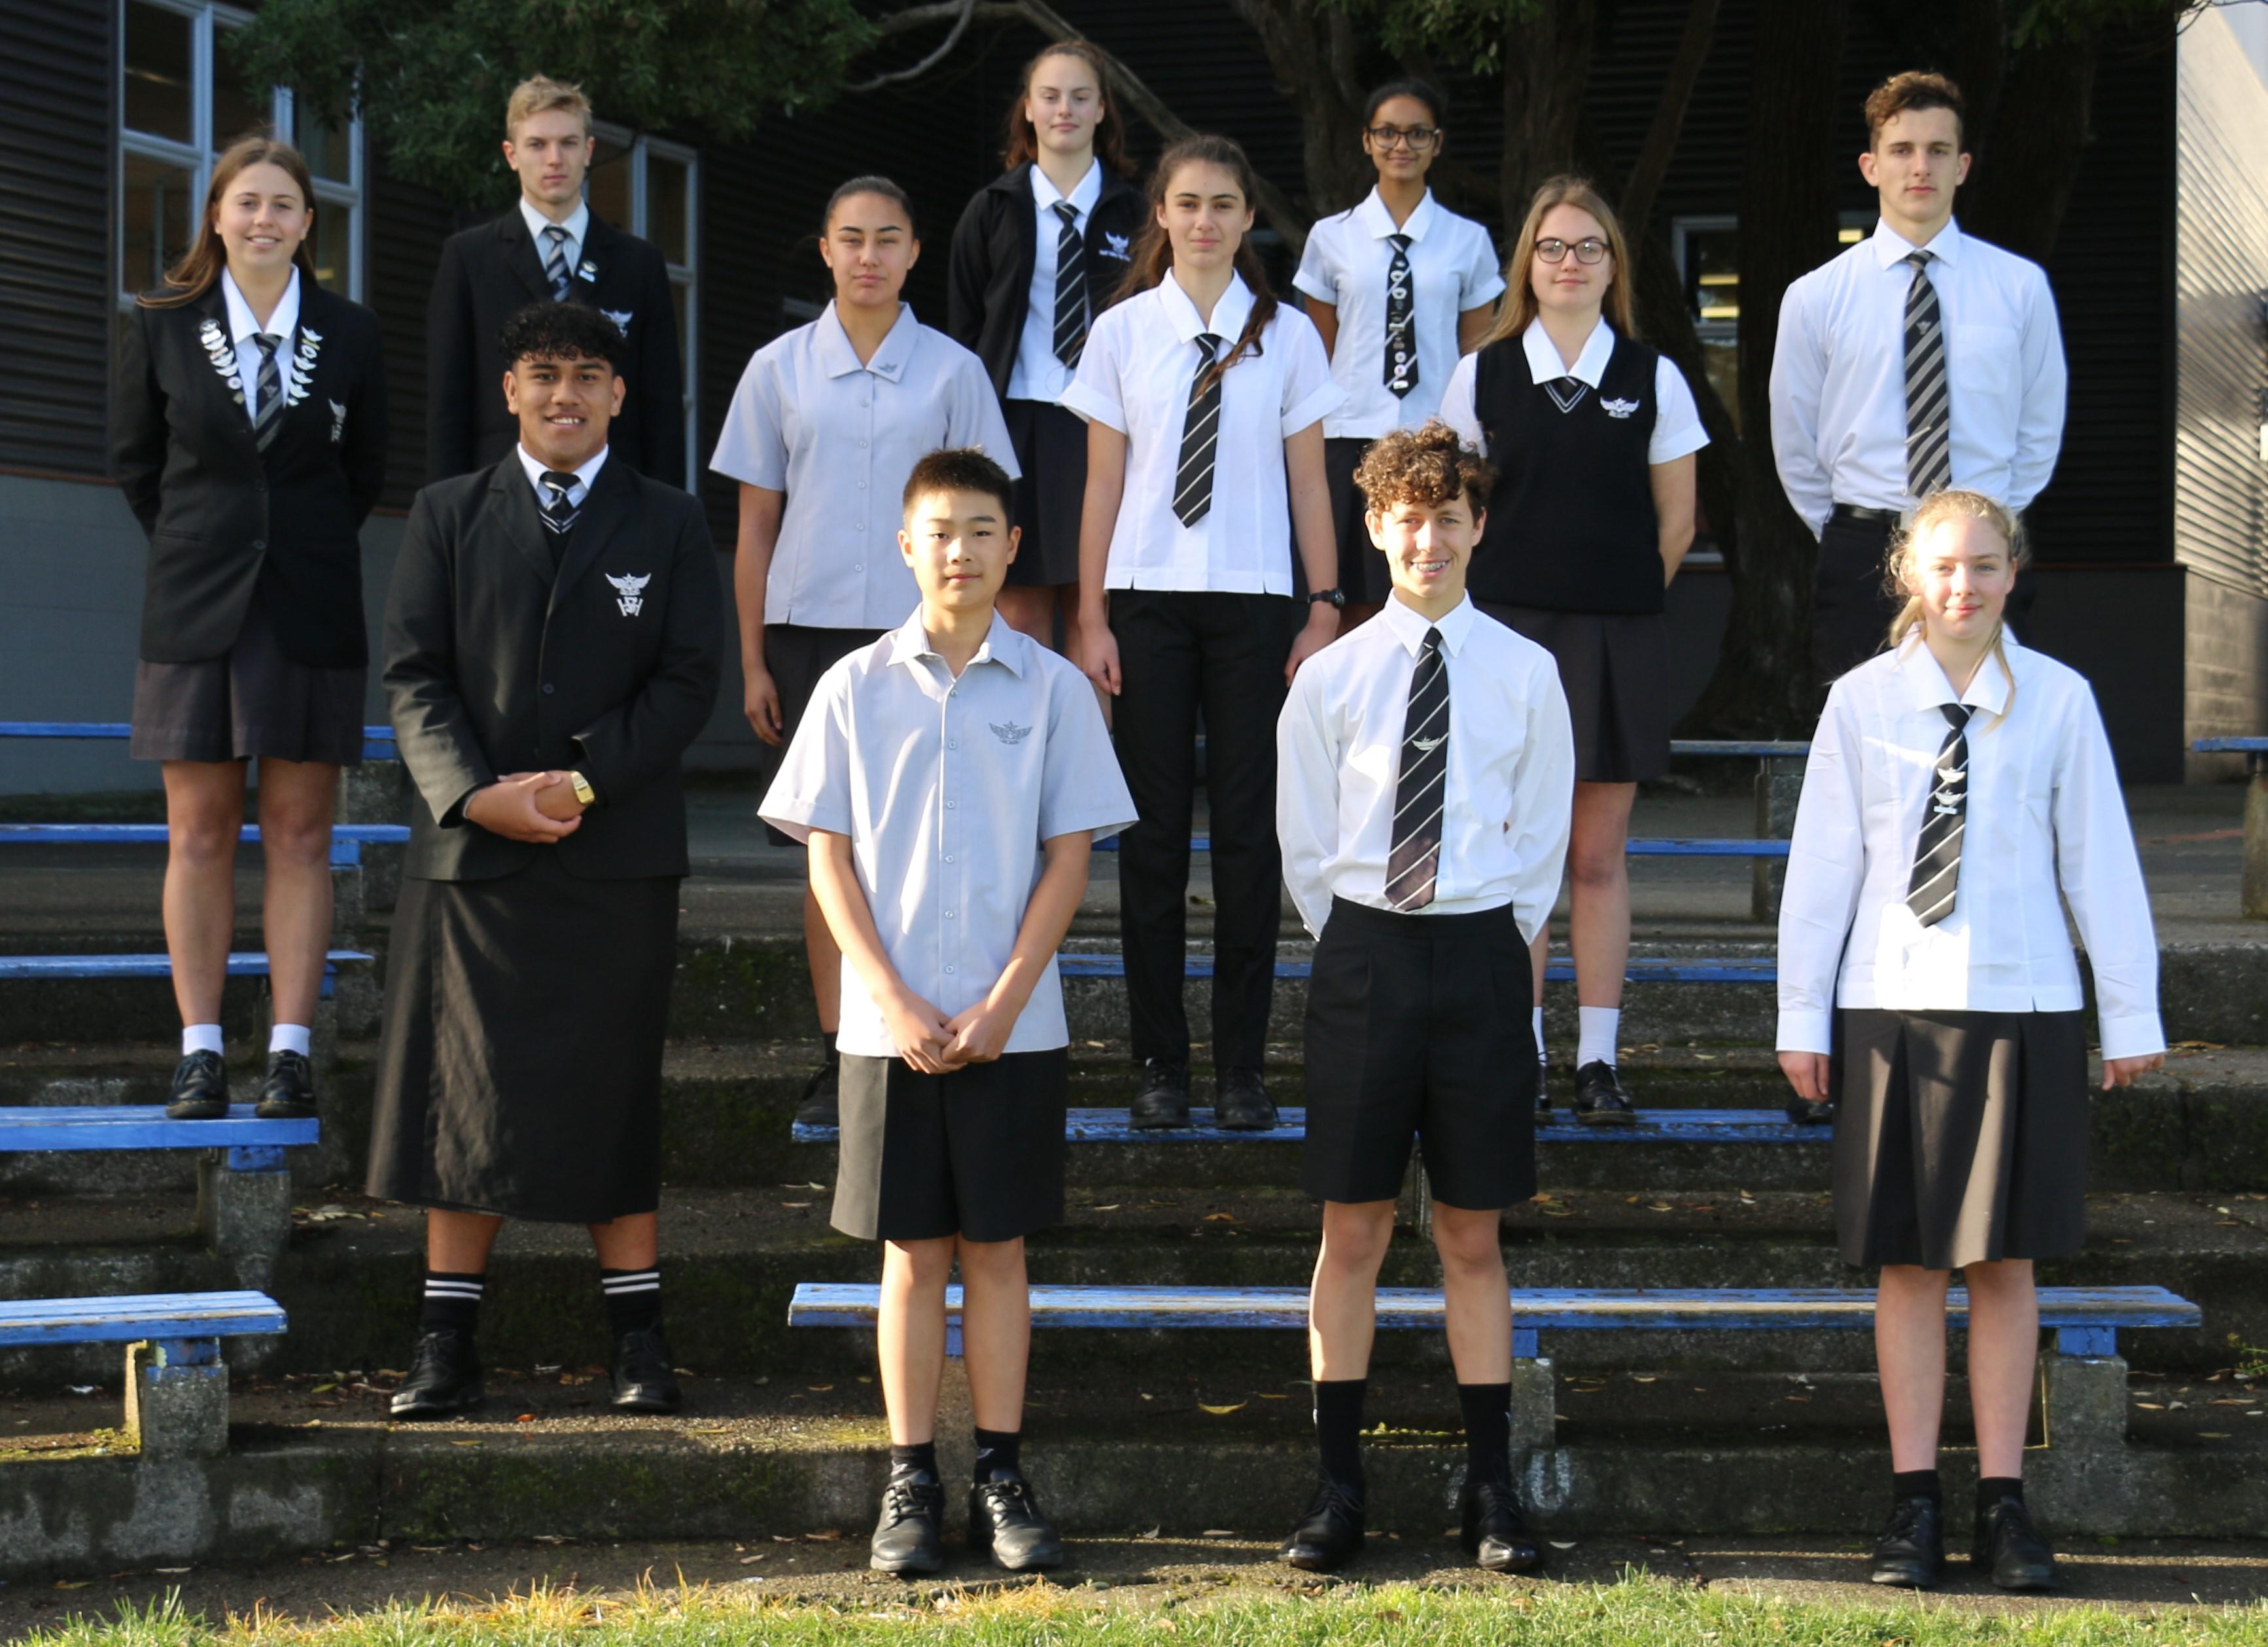 all students should wear school uniforms